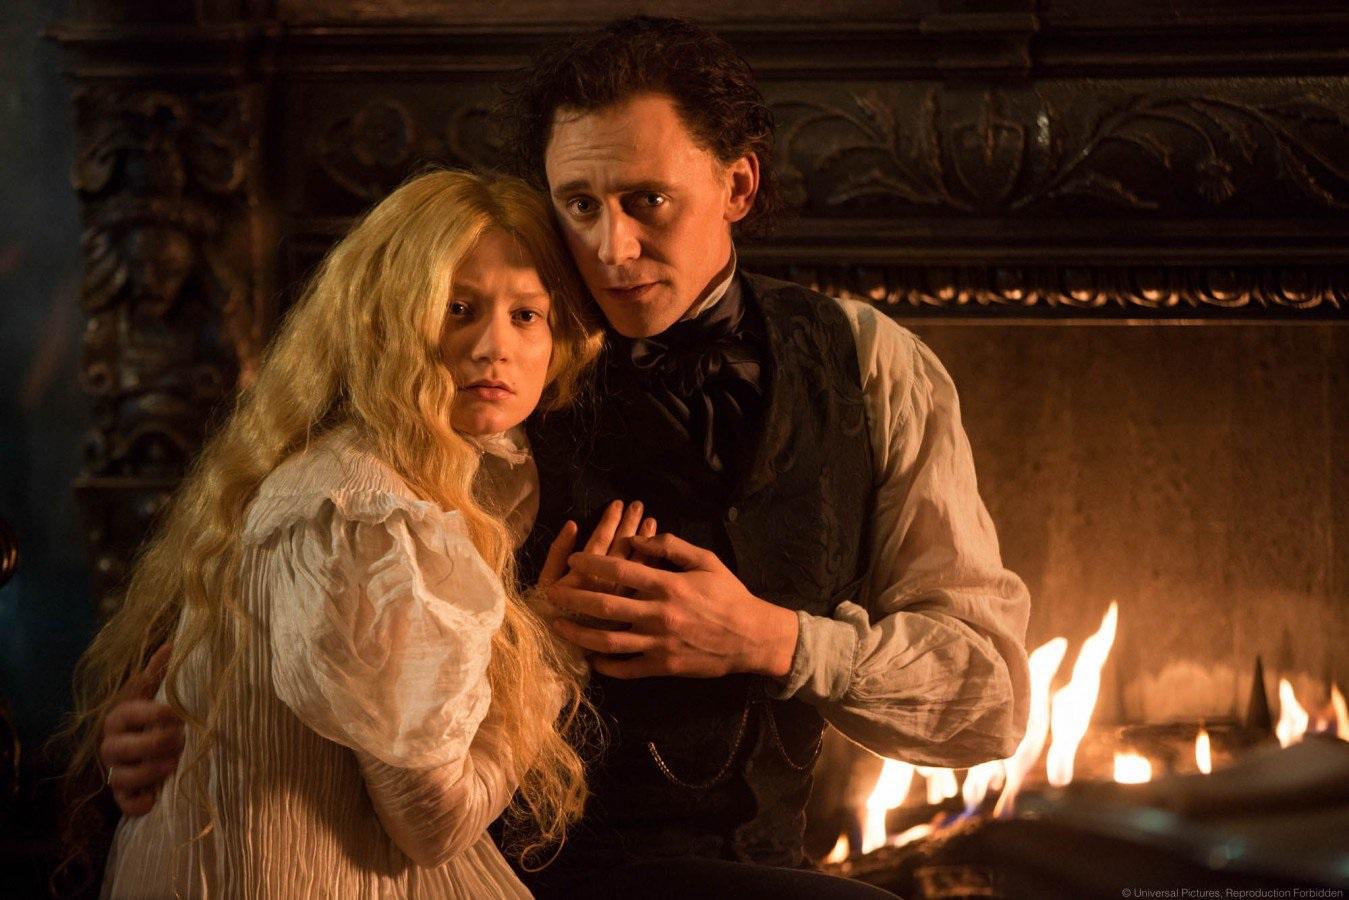 Mia Wasikowska and Tom Hiddleston in Crimson Peak (2015)